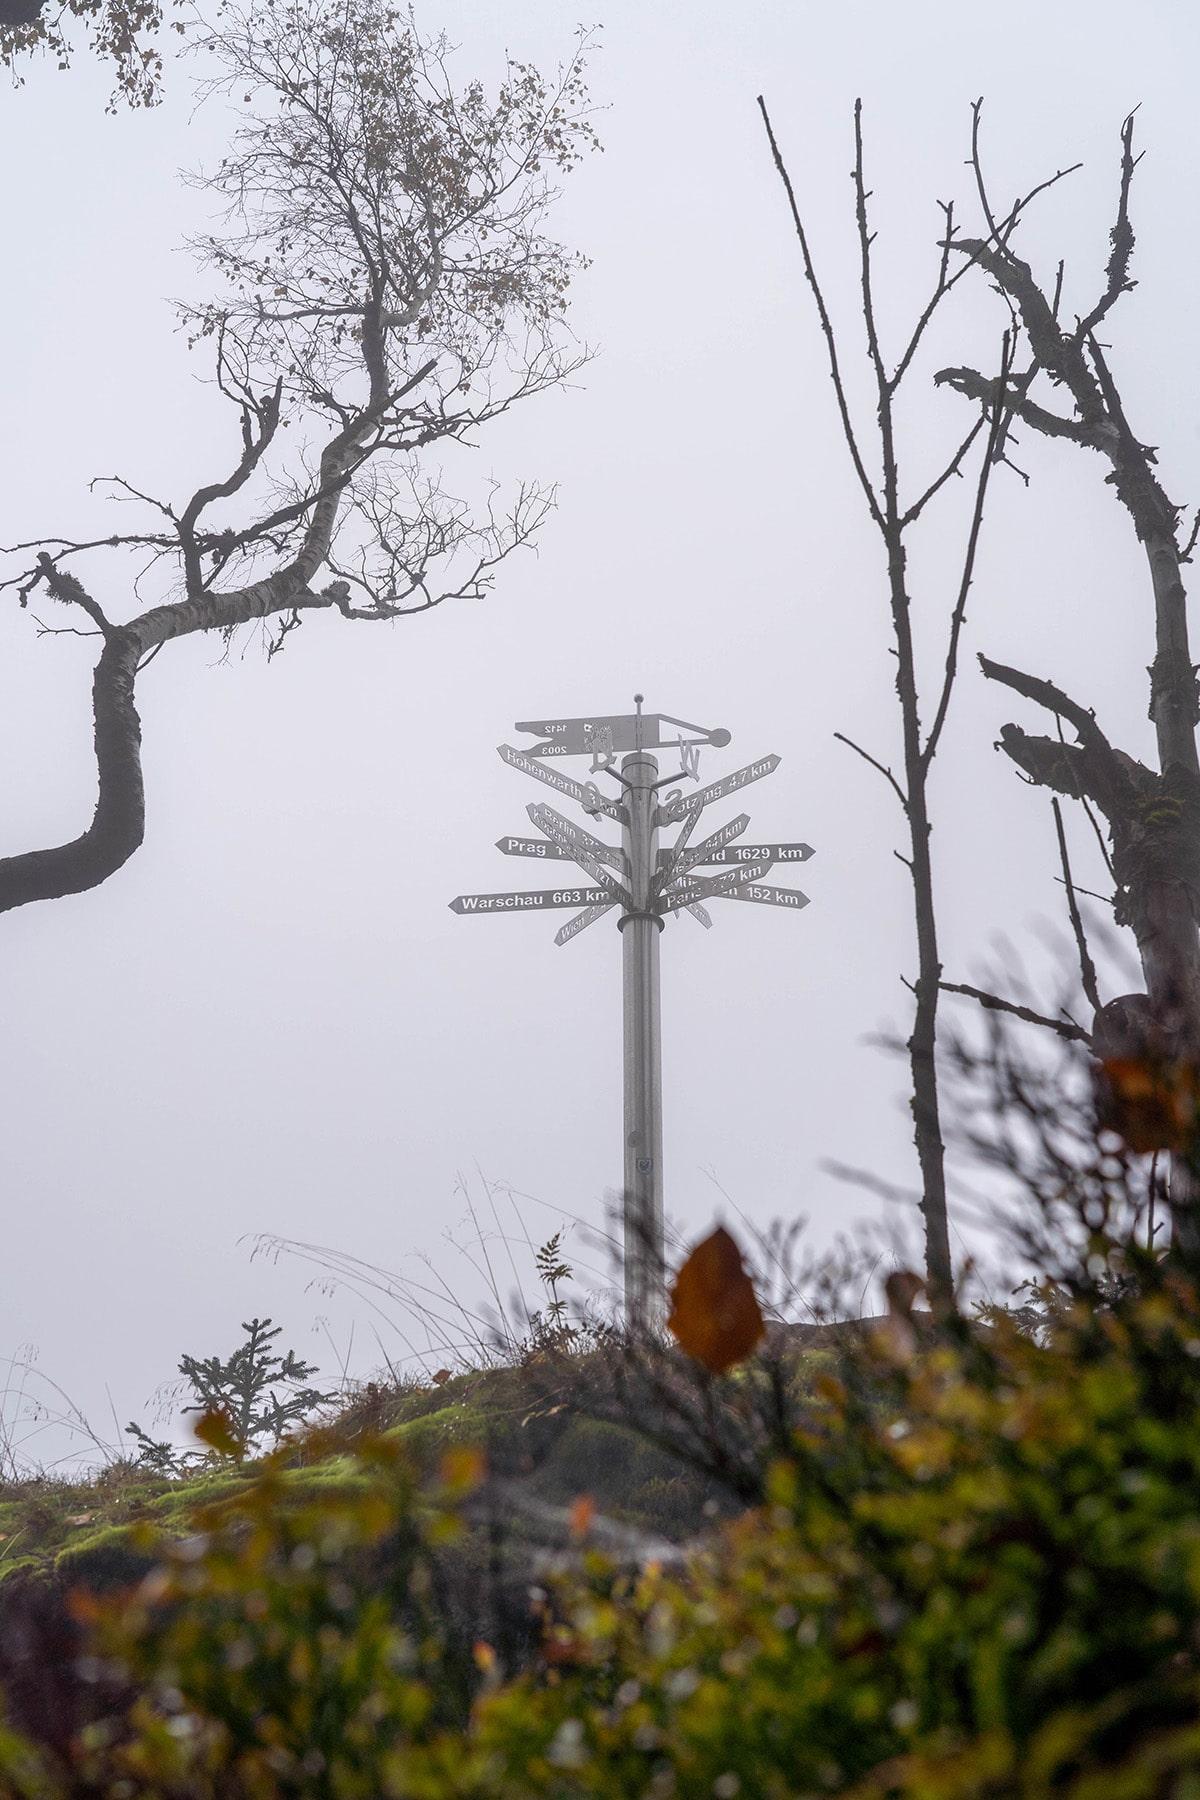 kaitersberg-nebel-schilder